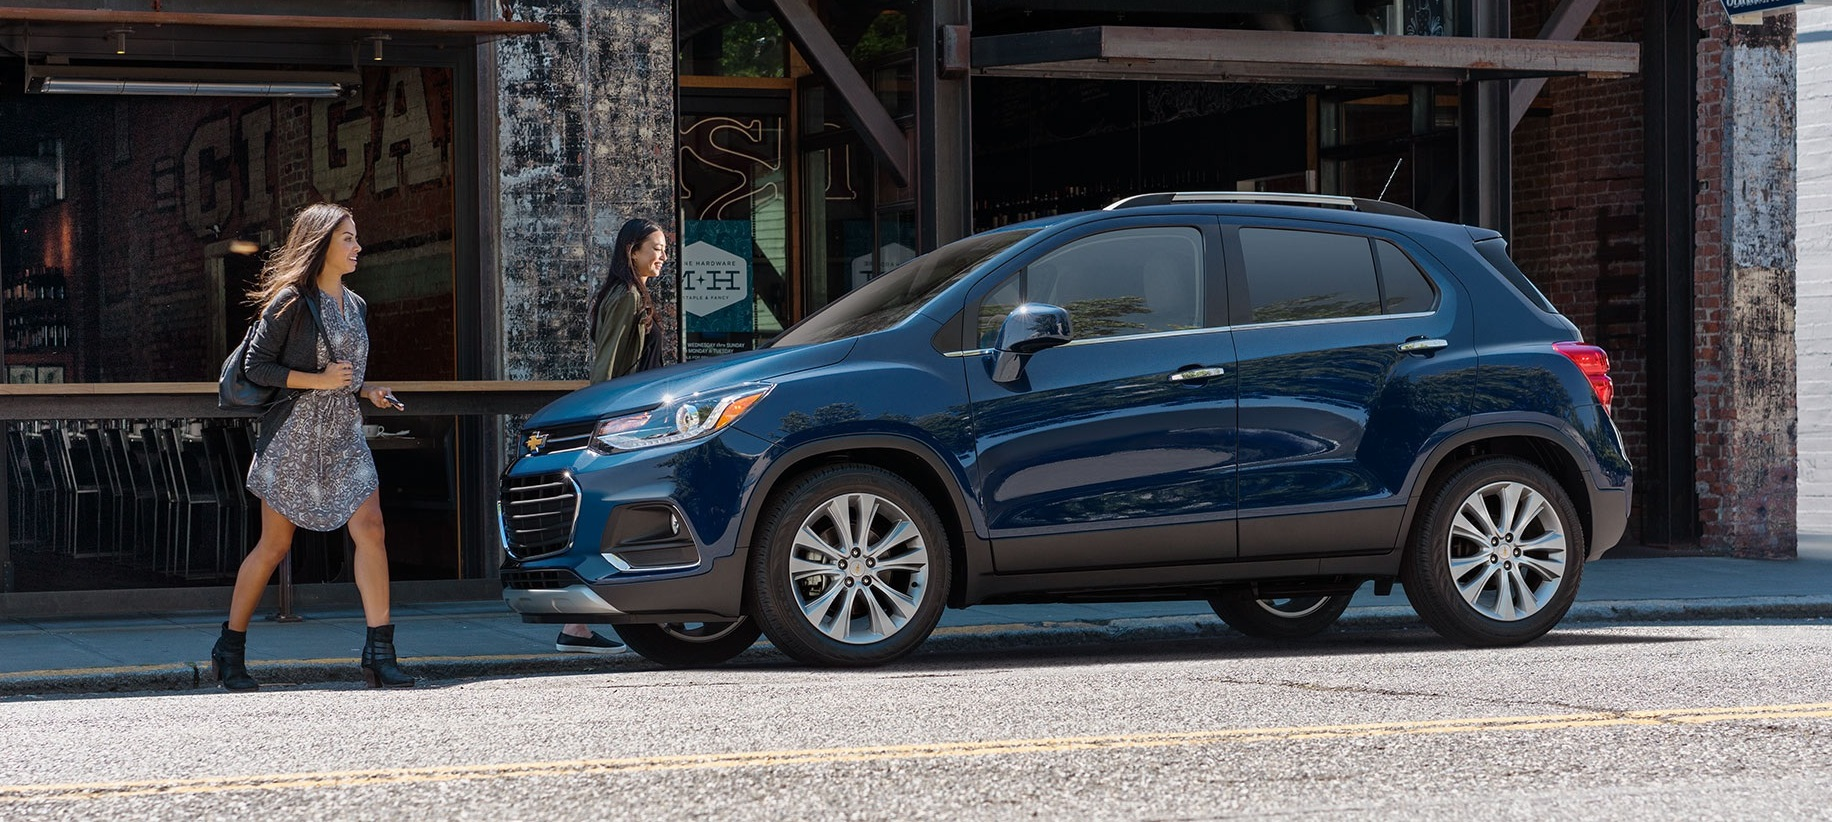 2020 Chevrolet Trax for Sale near Portage, IN